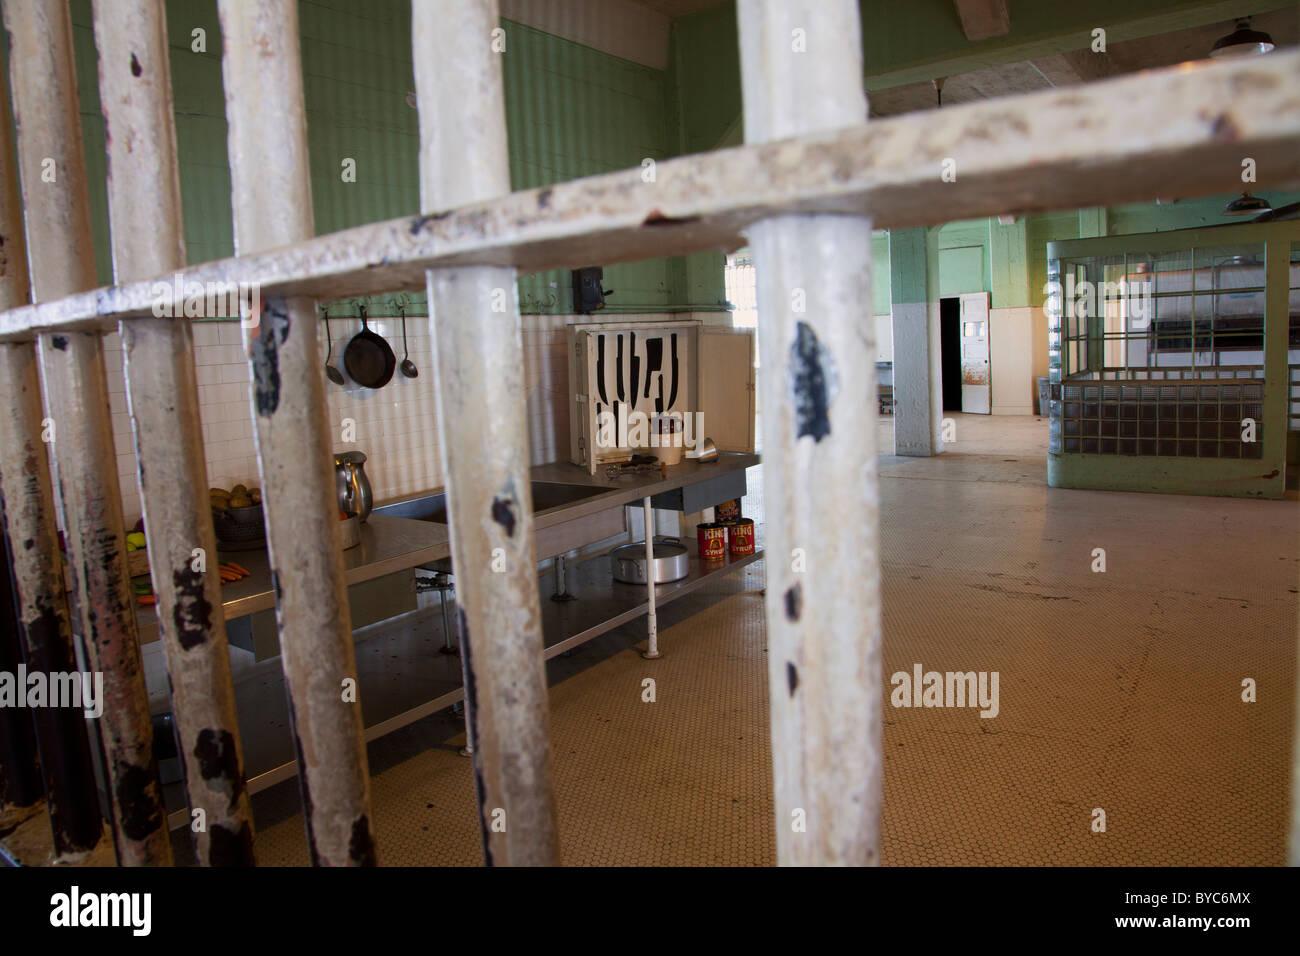 Kitchen area inside cell house at Alcatraz, San Francisco, CA - Stock Image